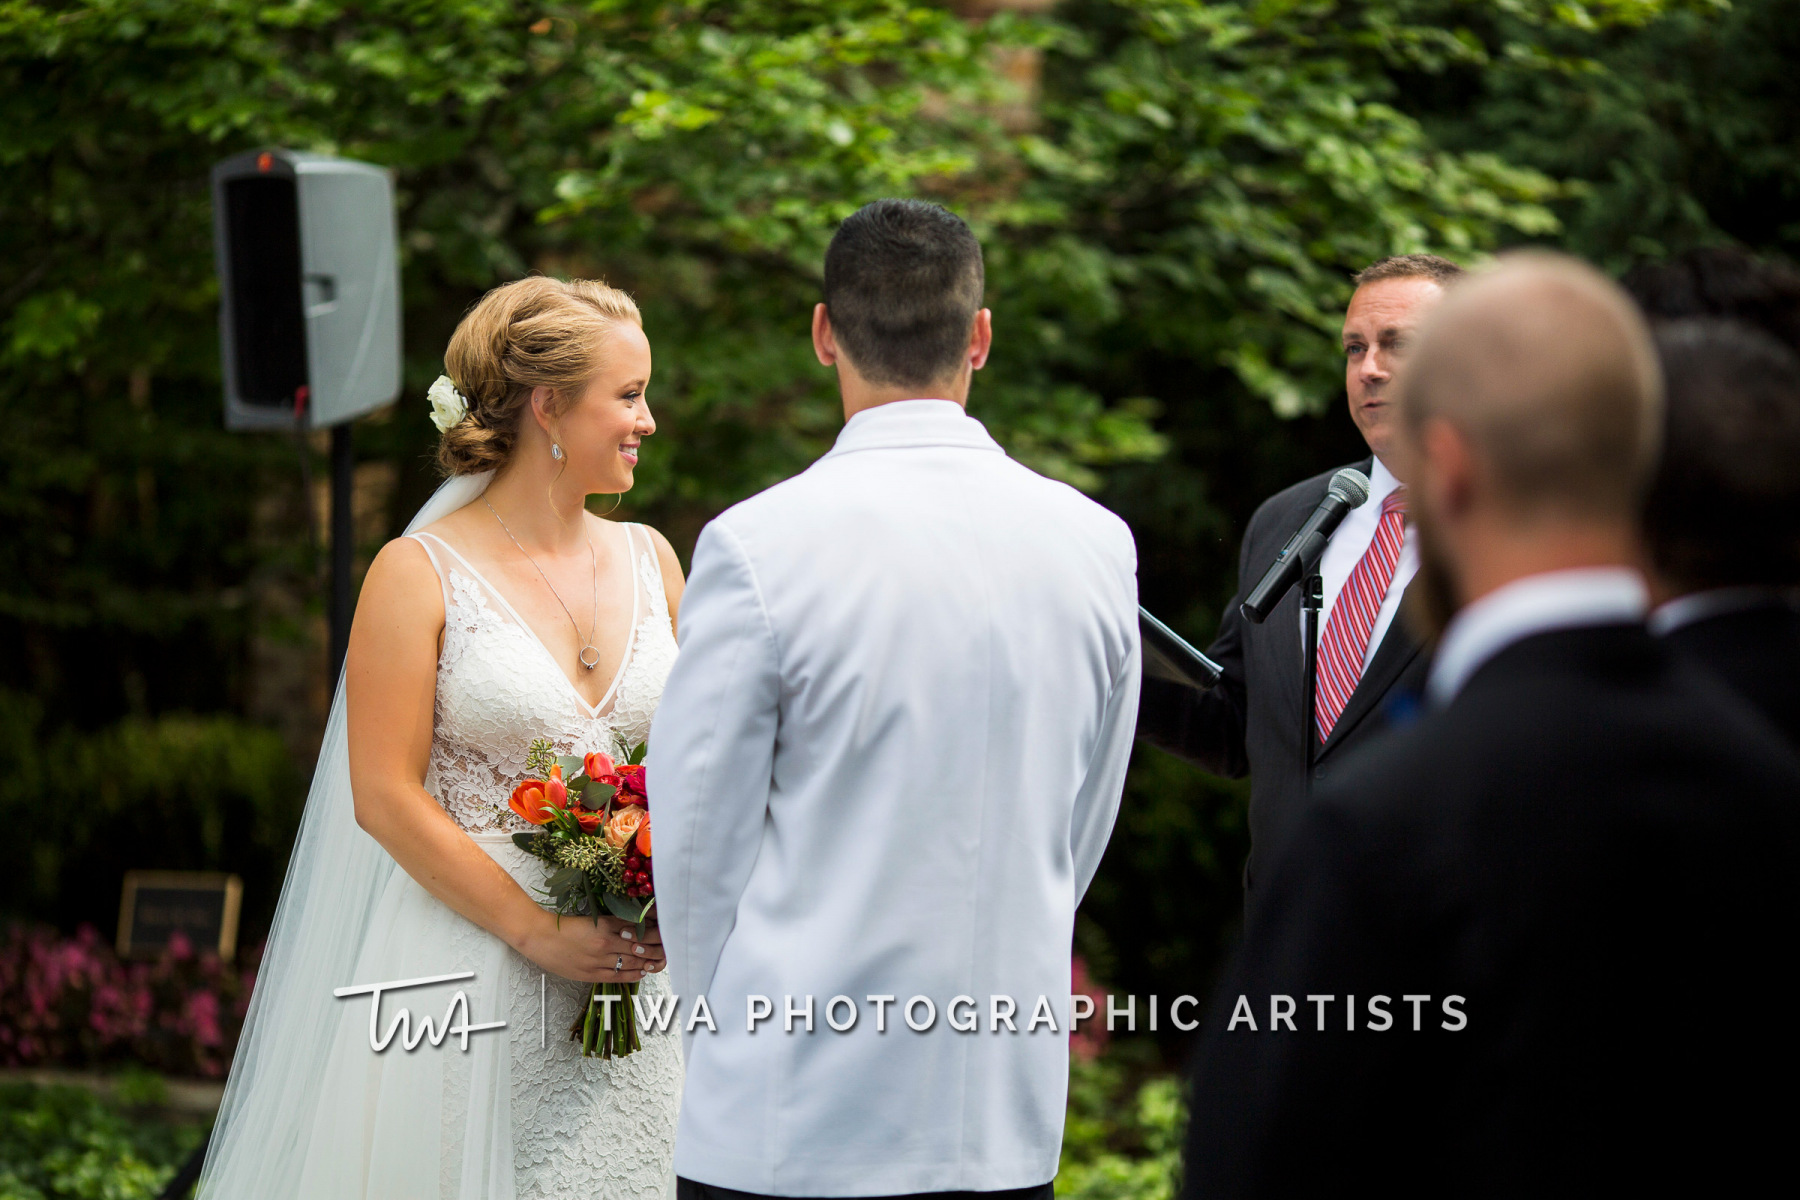 Chicago-Wedding-Photographers-Renaissance-Hotel_Hohensee_Fleishman_JG_DK-025-1117